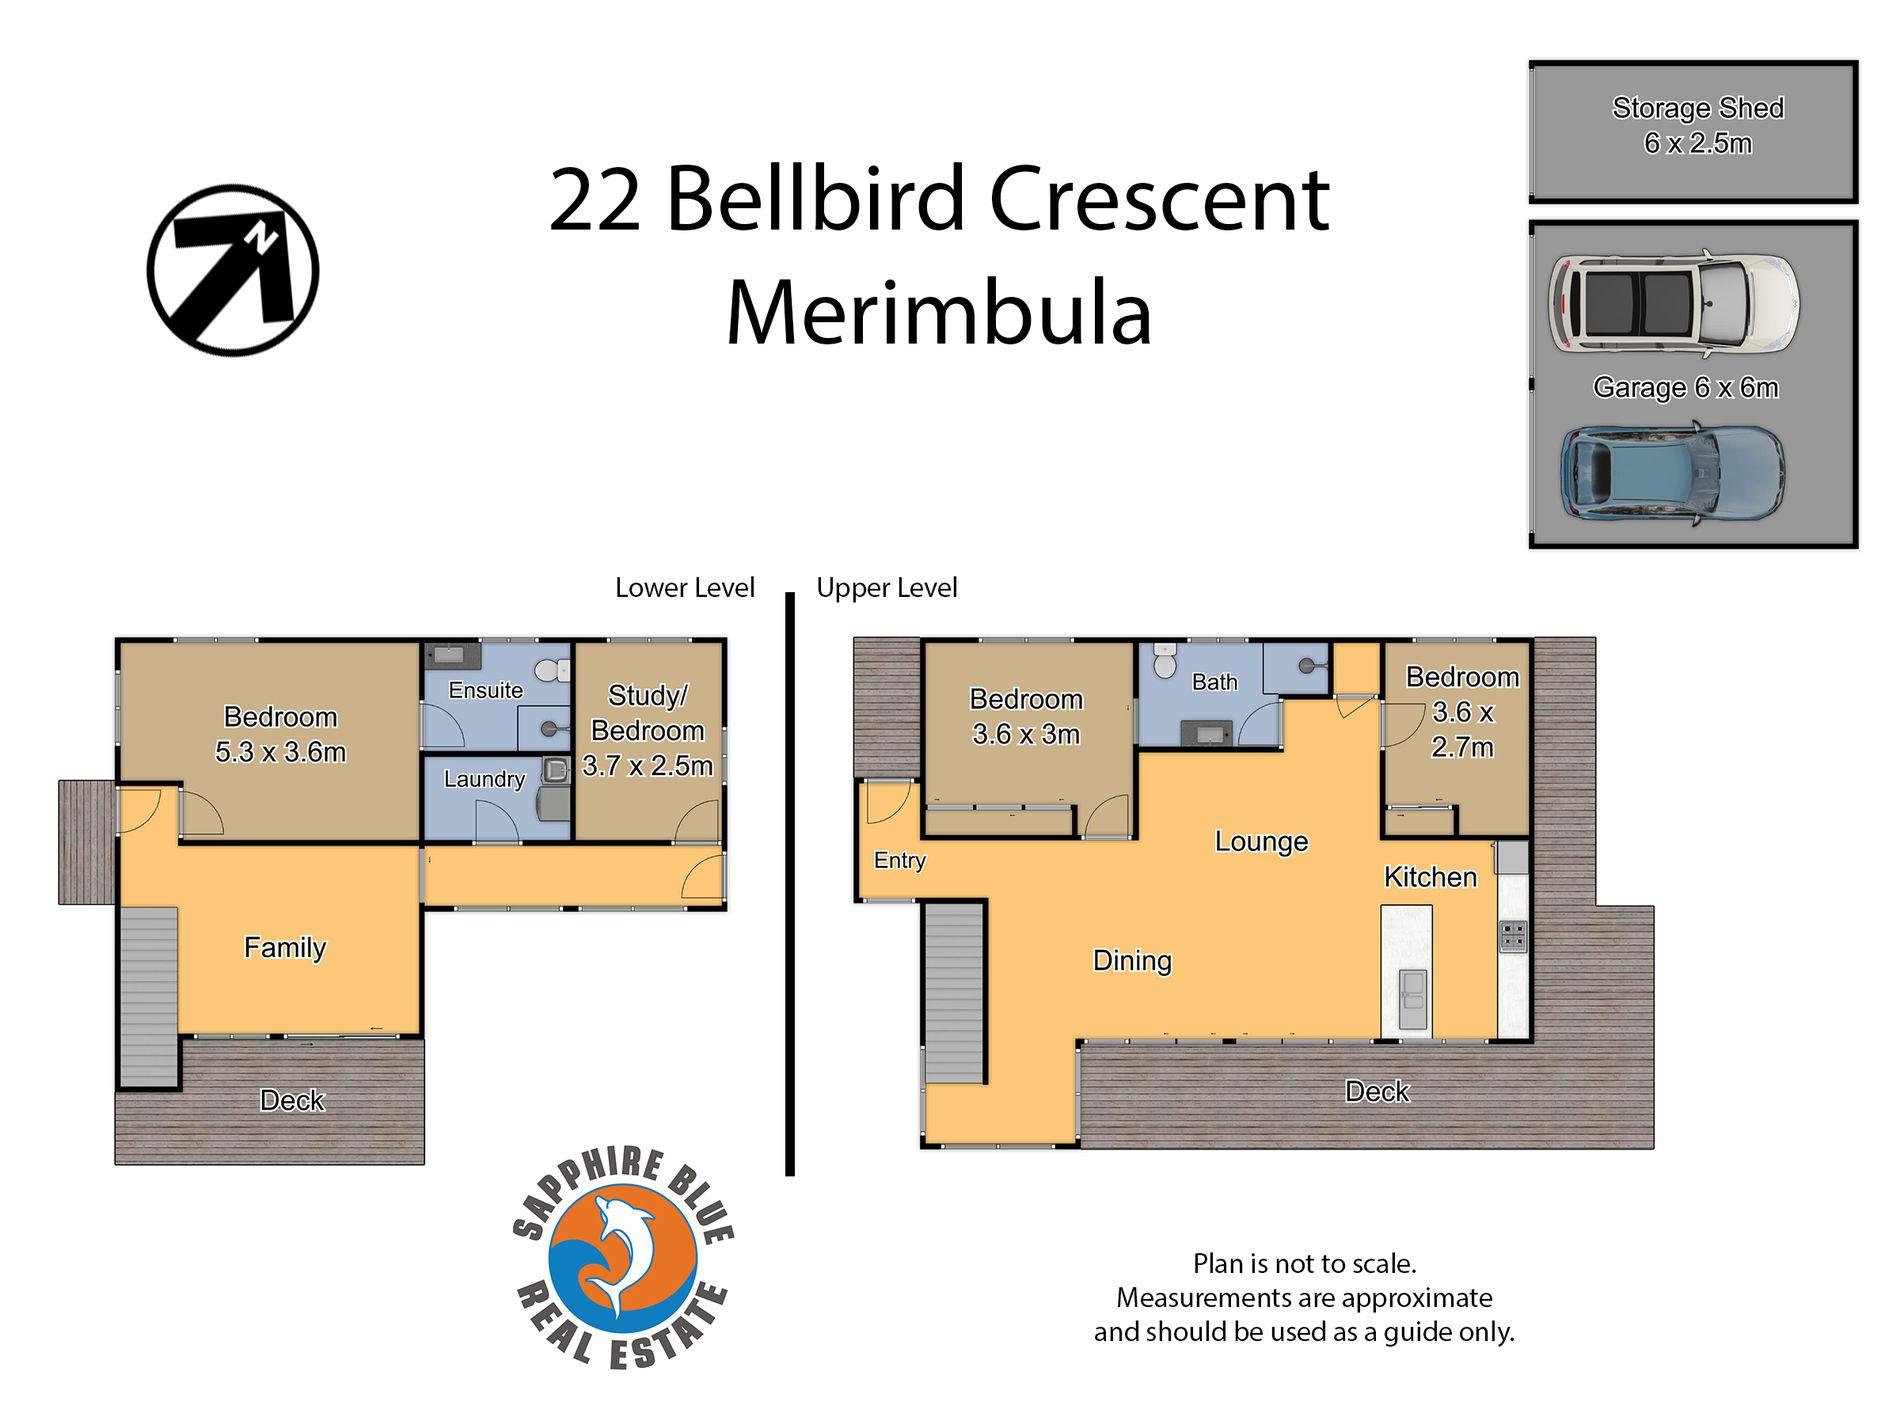 22 Bellbird Crescent, Merimbula